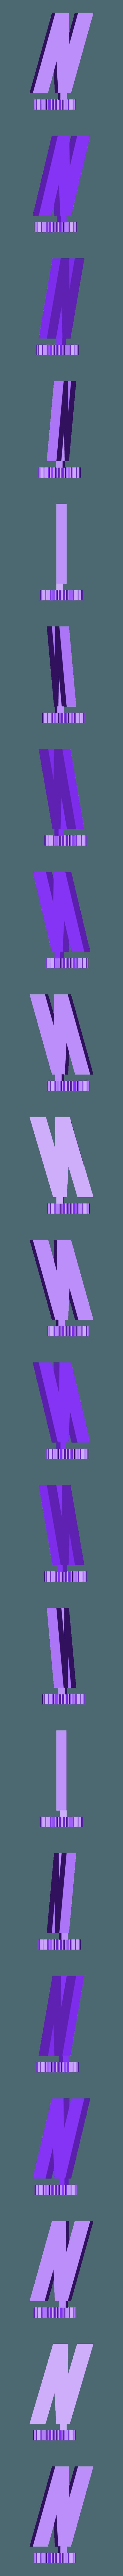 N, Avengers Logo.STL Download free STL file Avengers Rotating Logo • 3D printing template, potentprintables